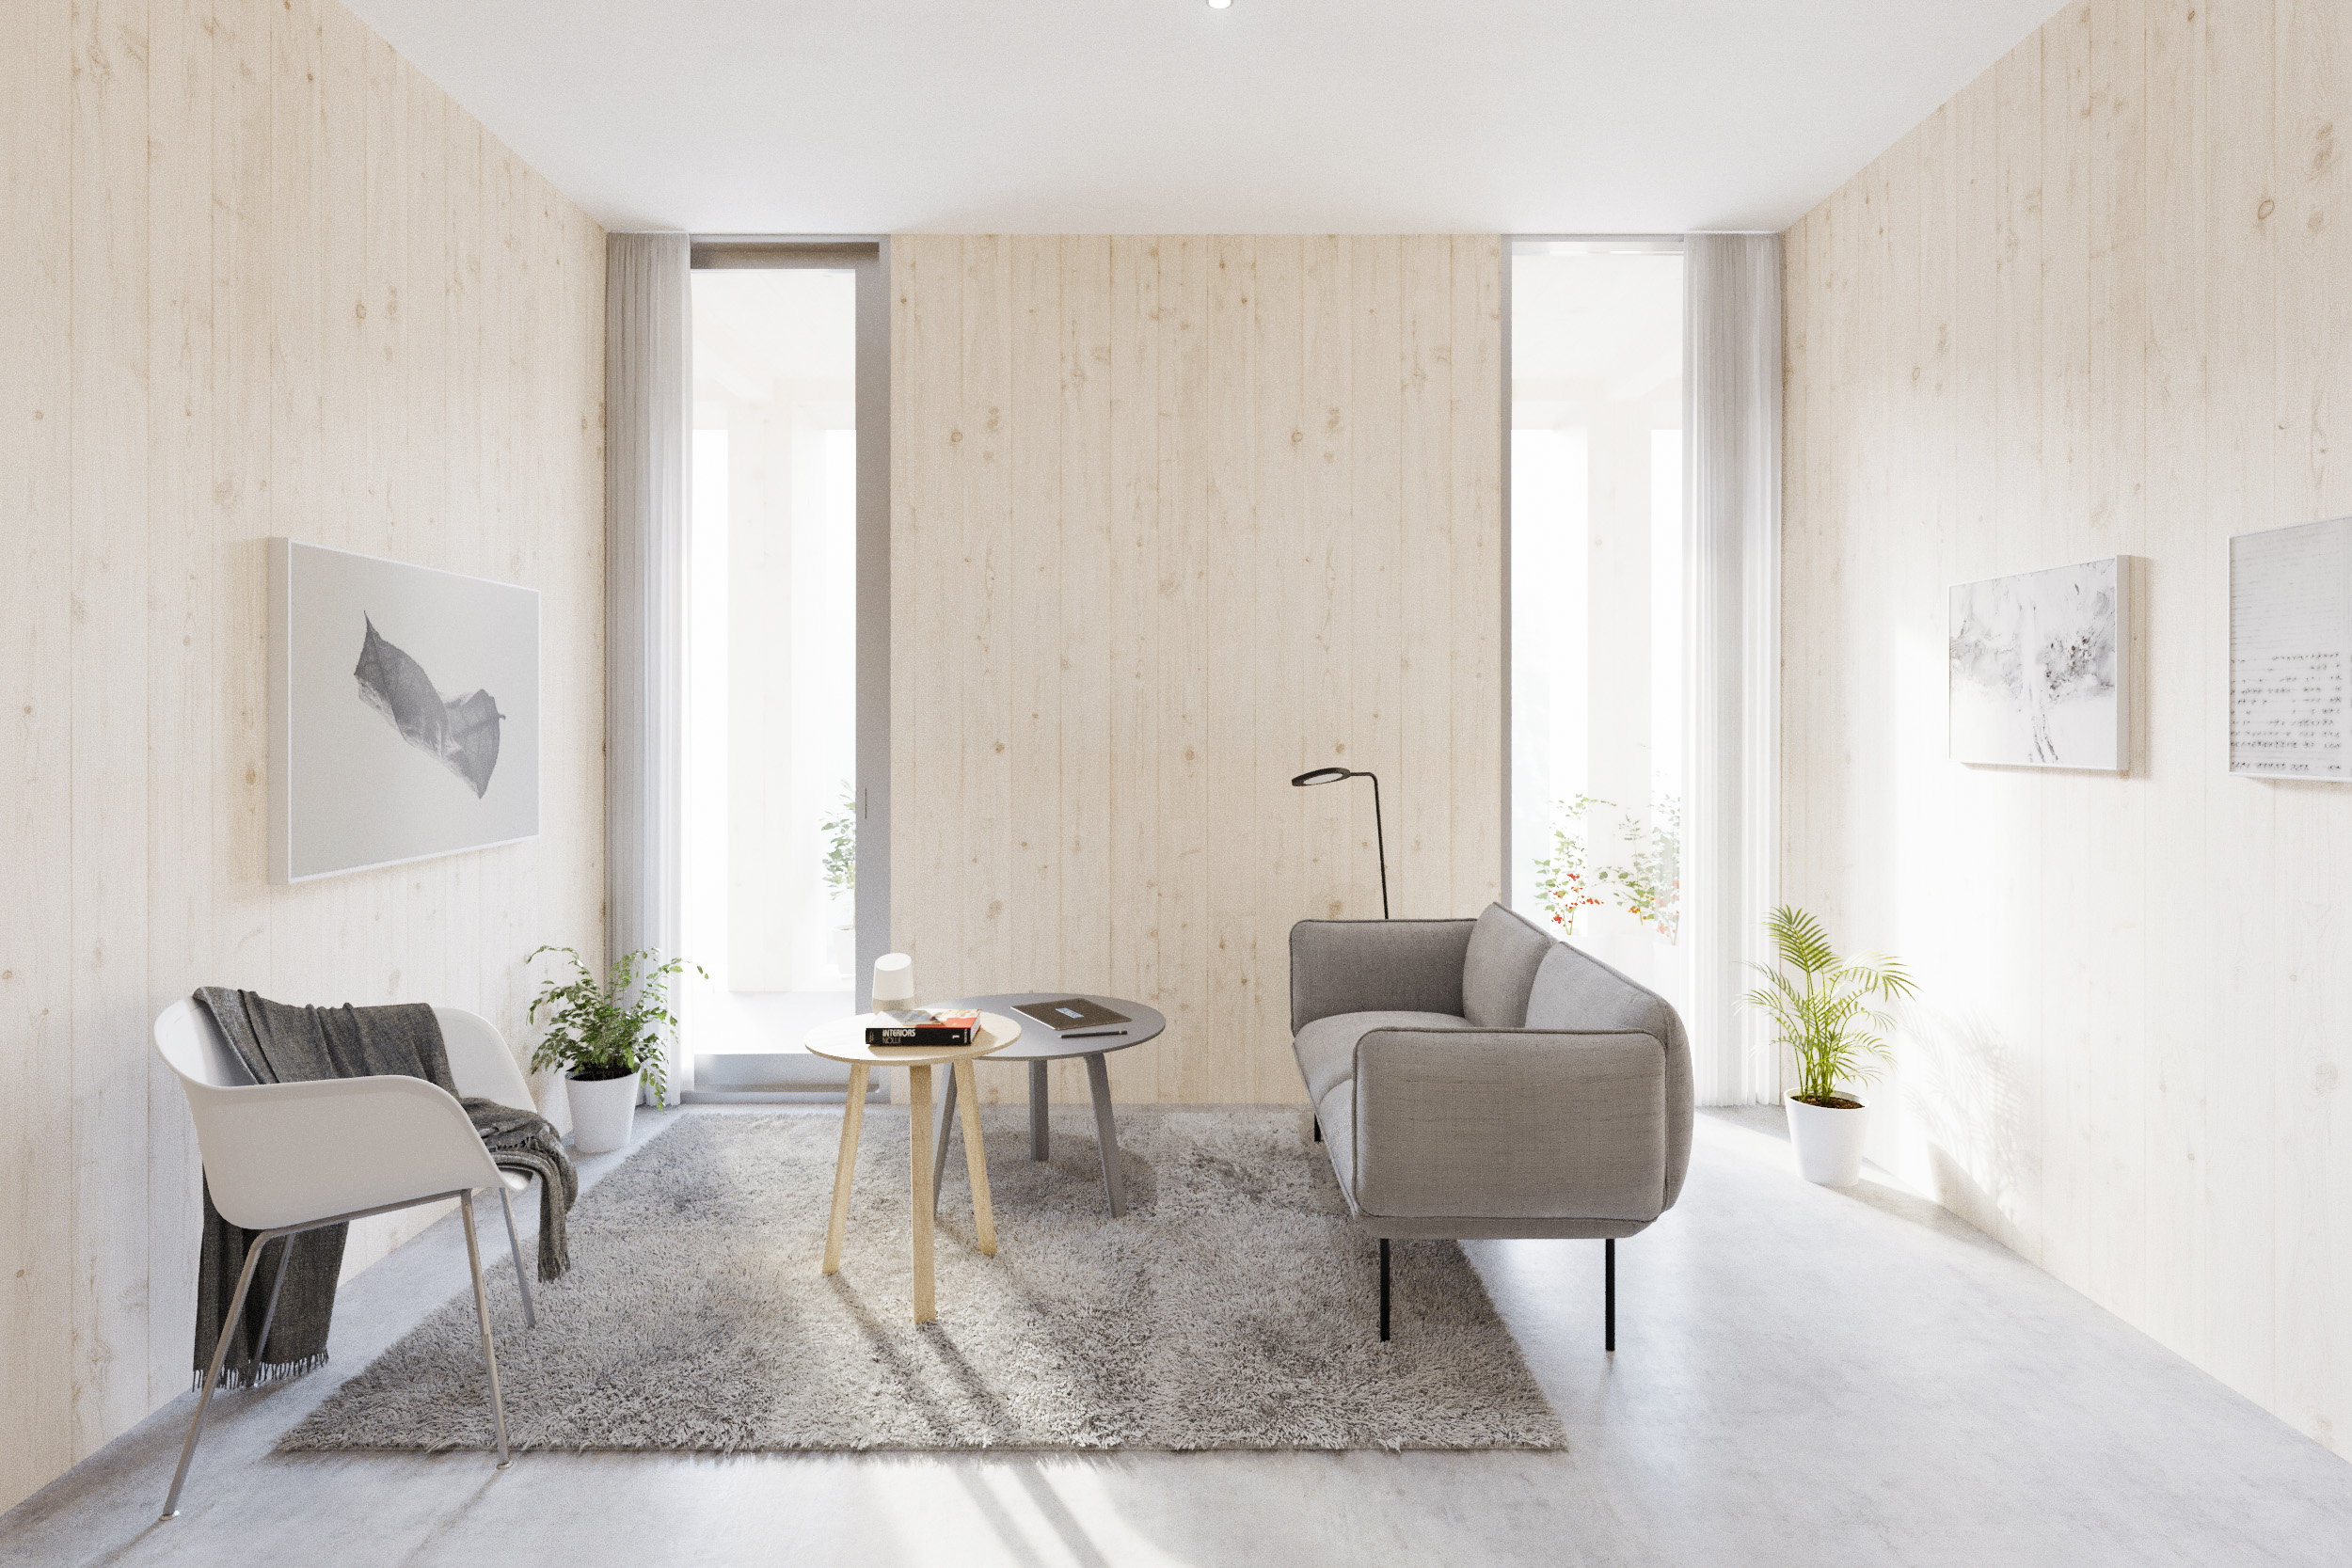 gh3 - SWL - Units - 2BR - Living Room